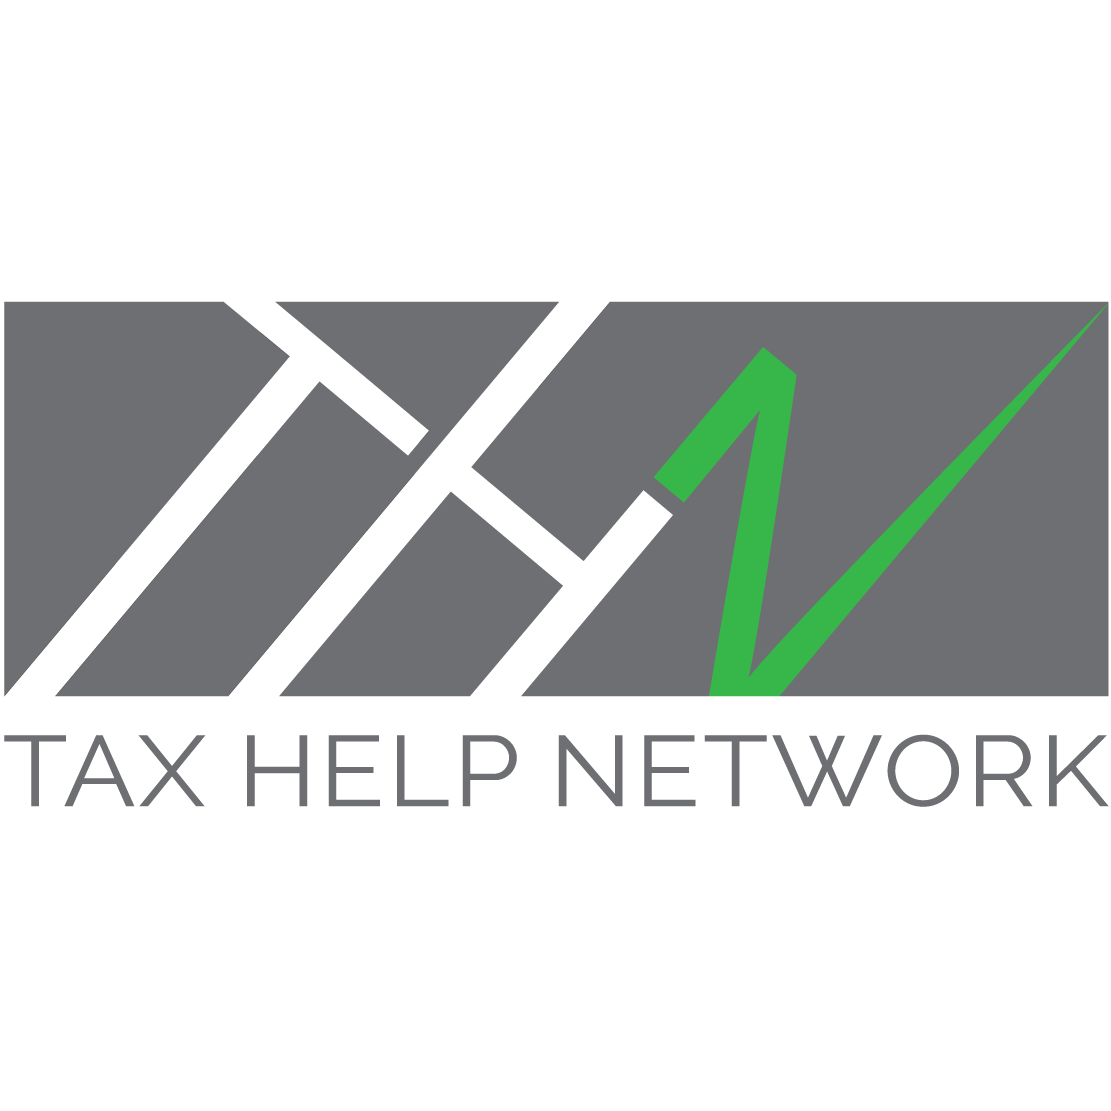 Tax Help Network